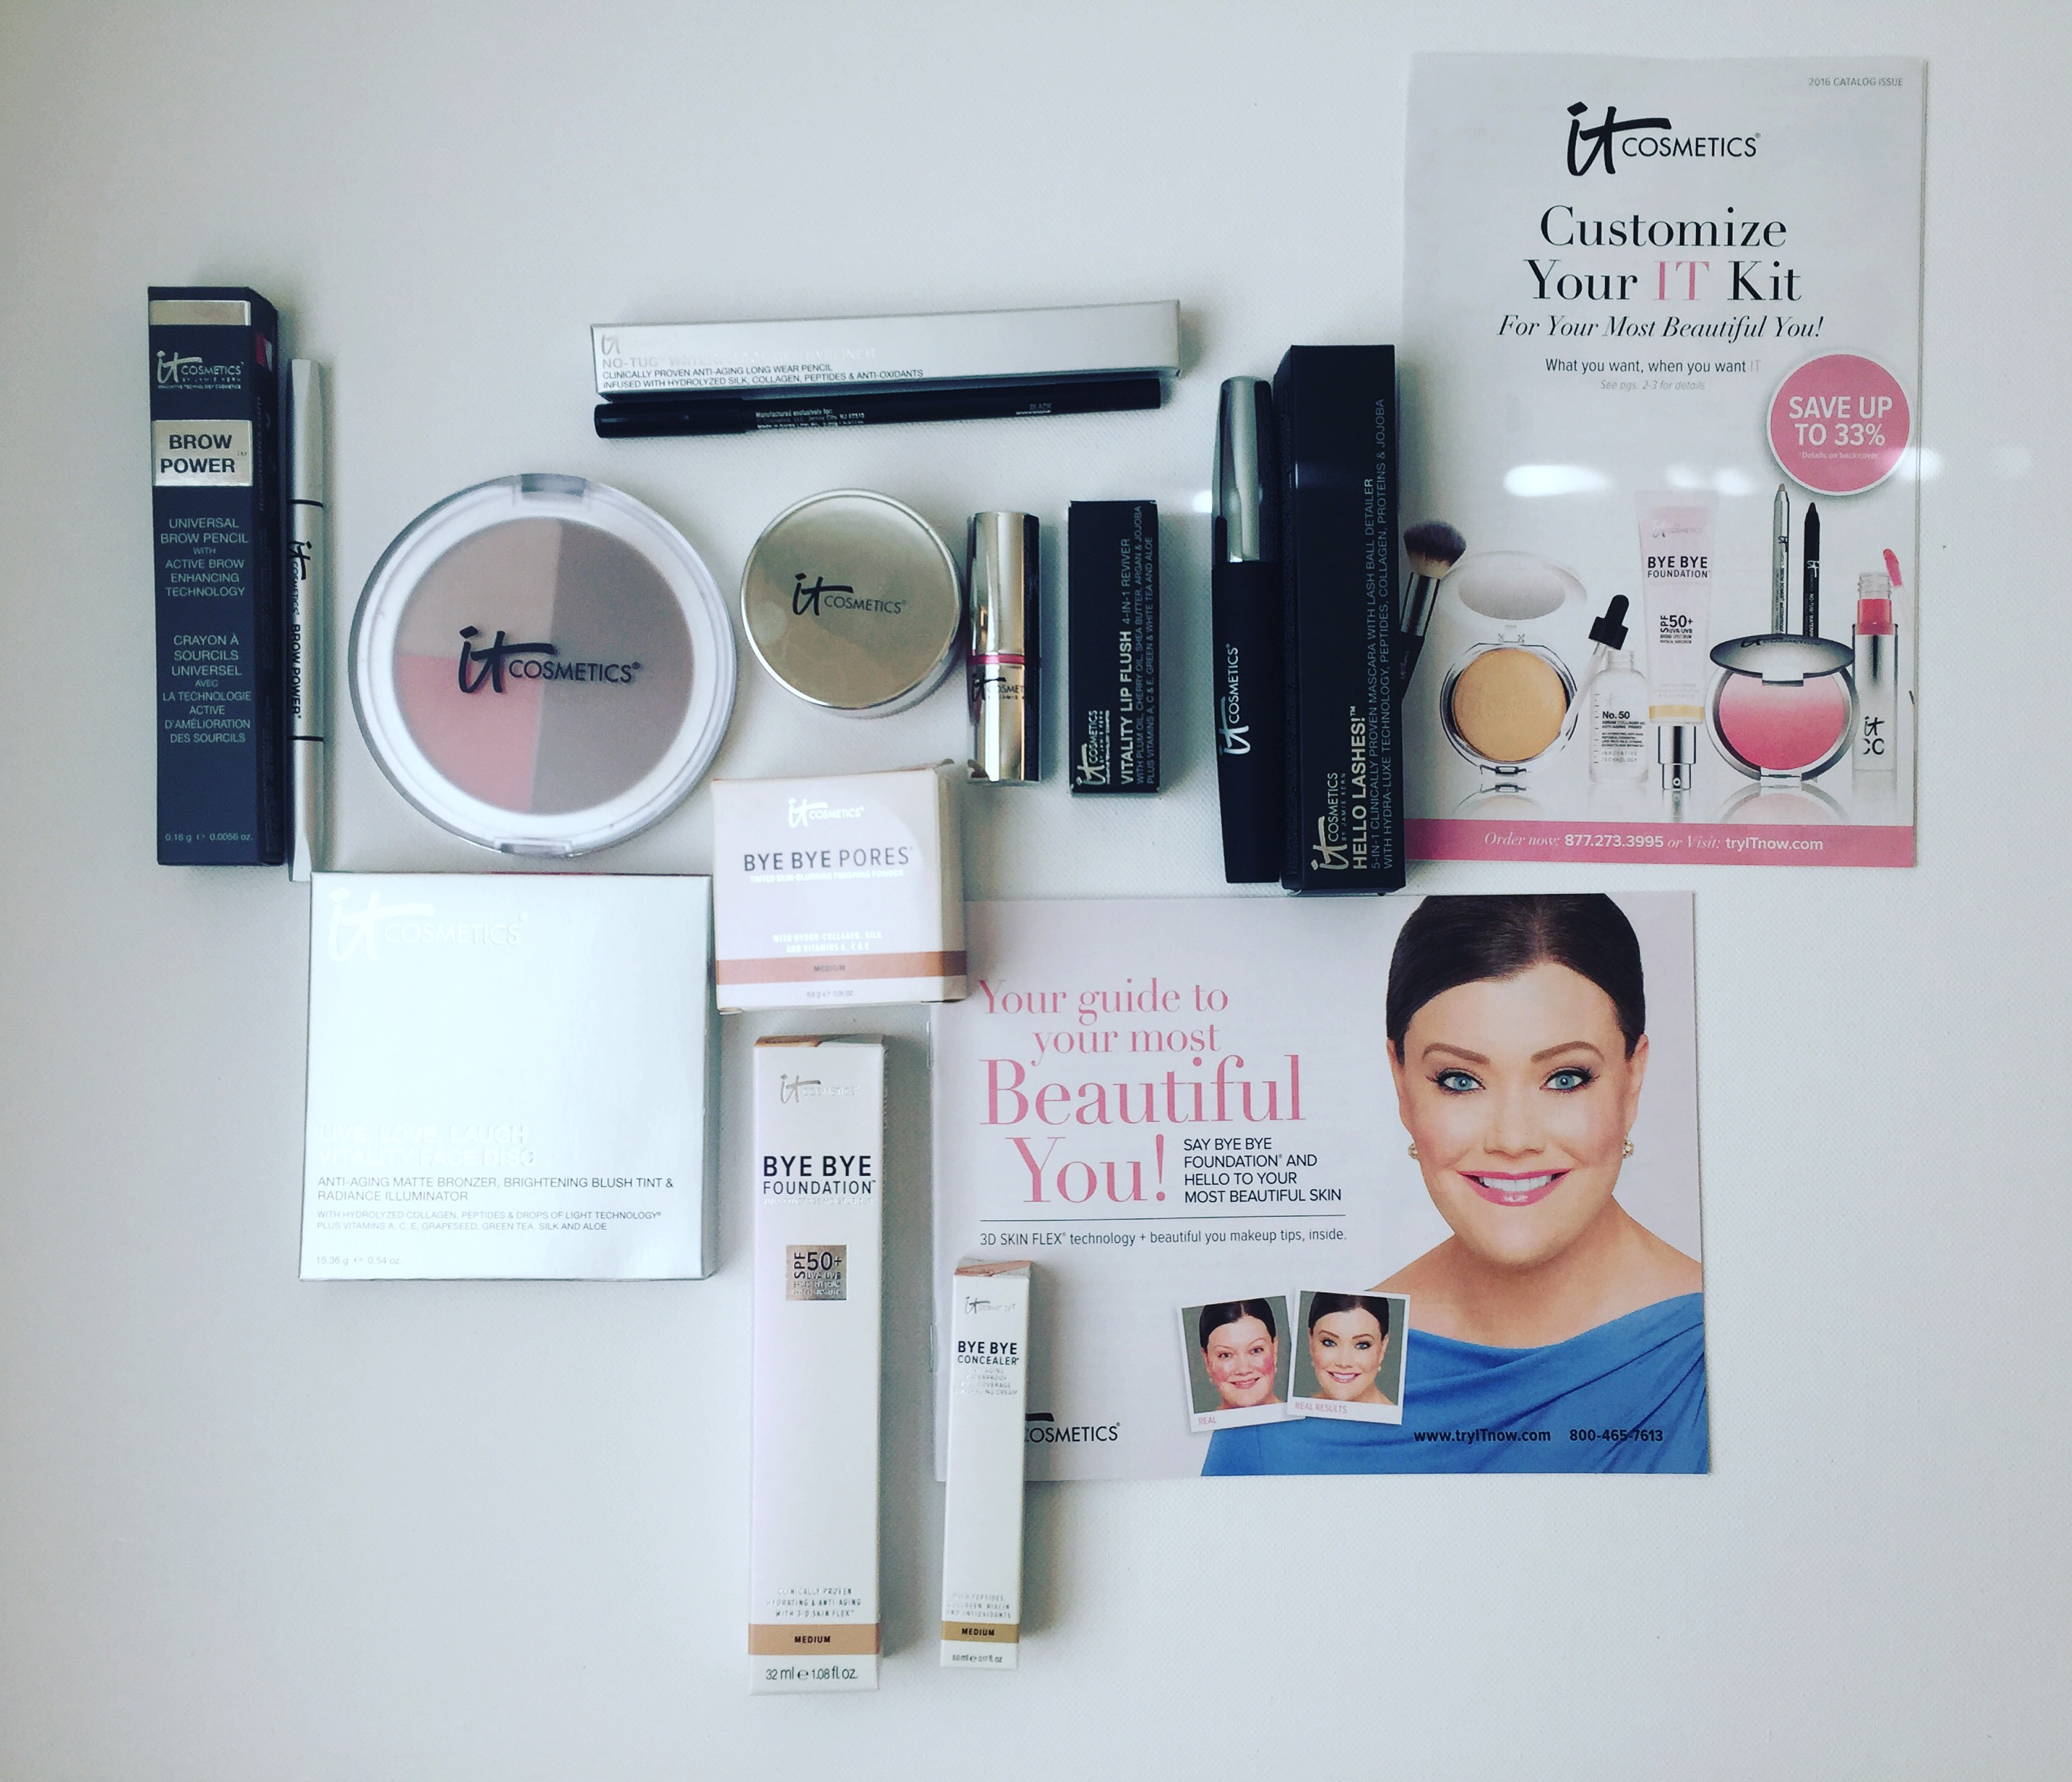 Bye Bye Foundation by IT Cosmetics